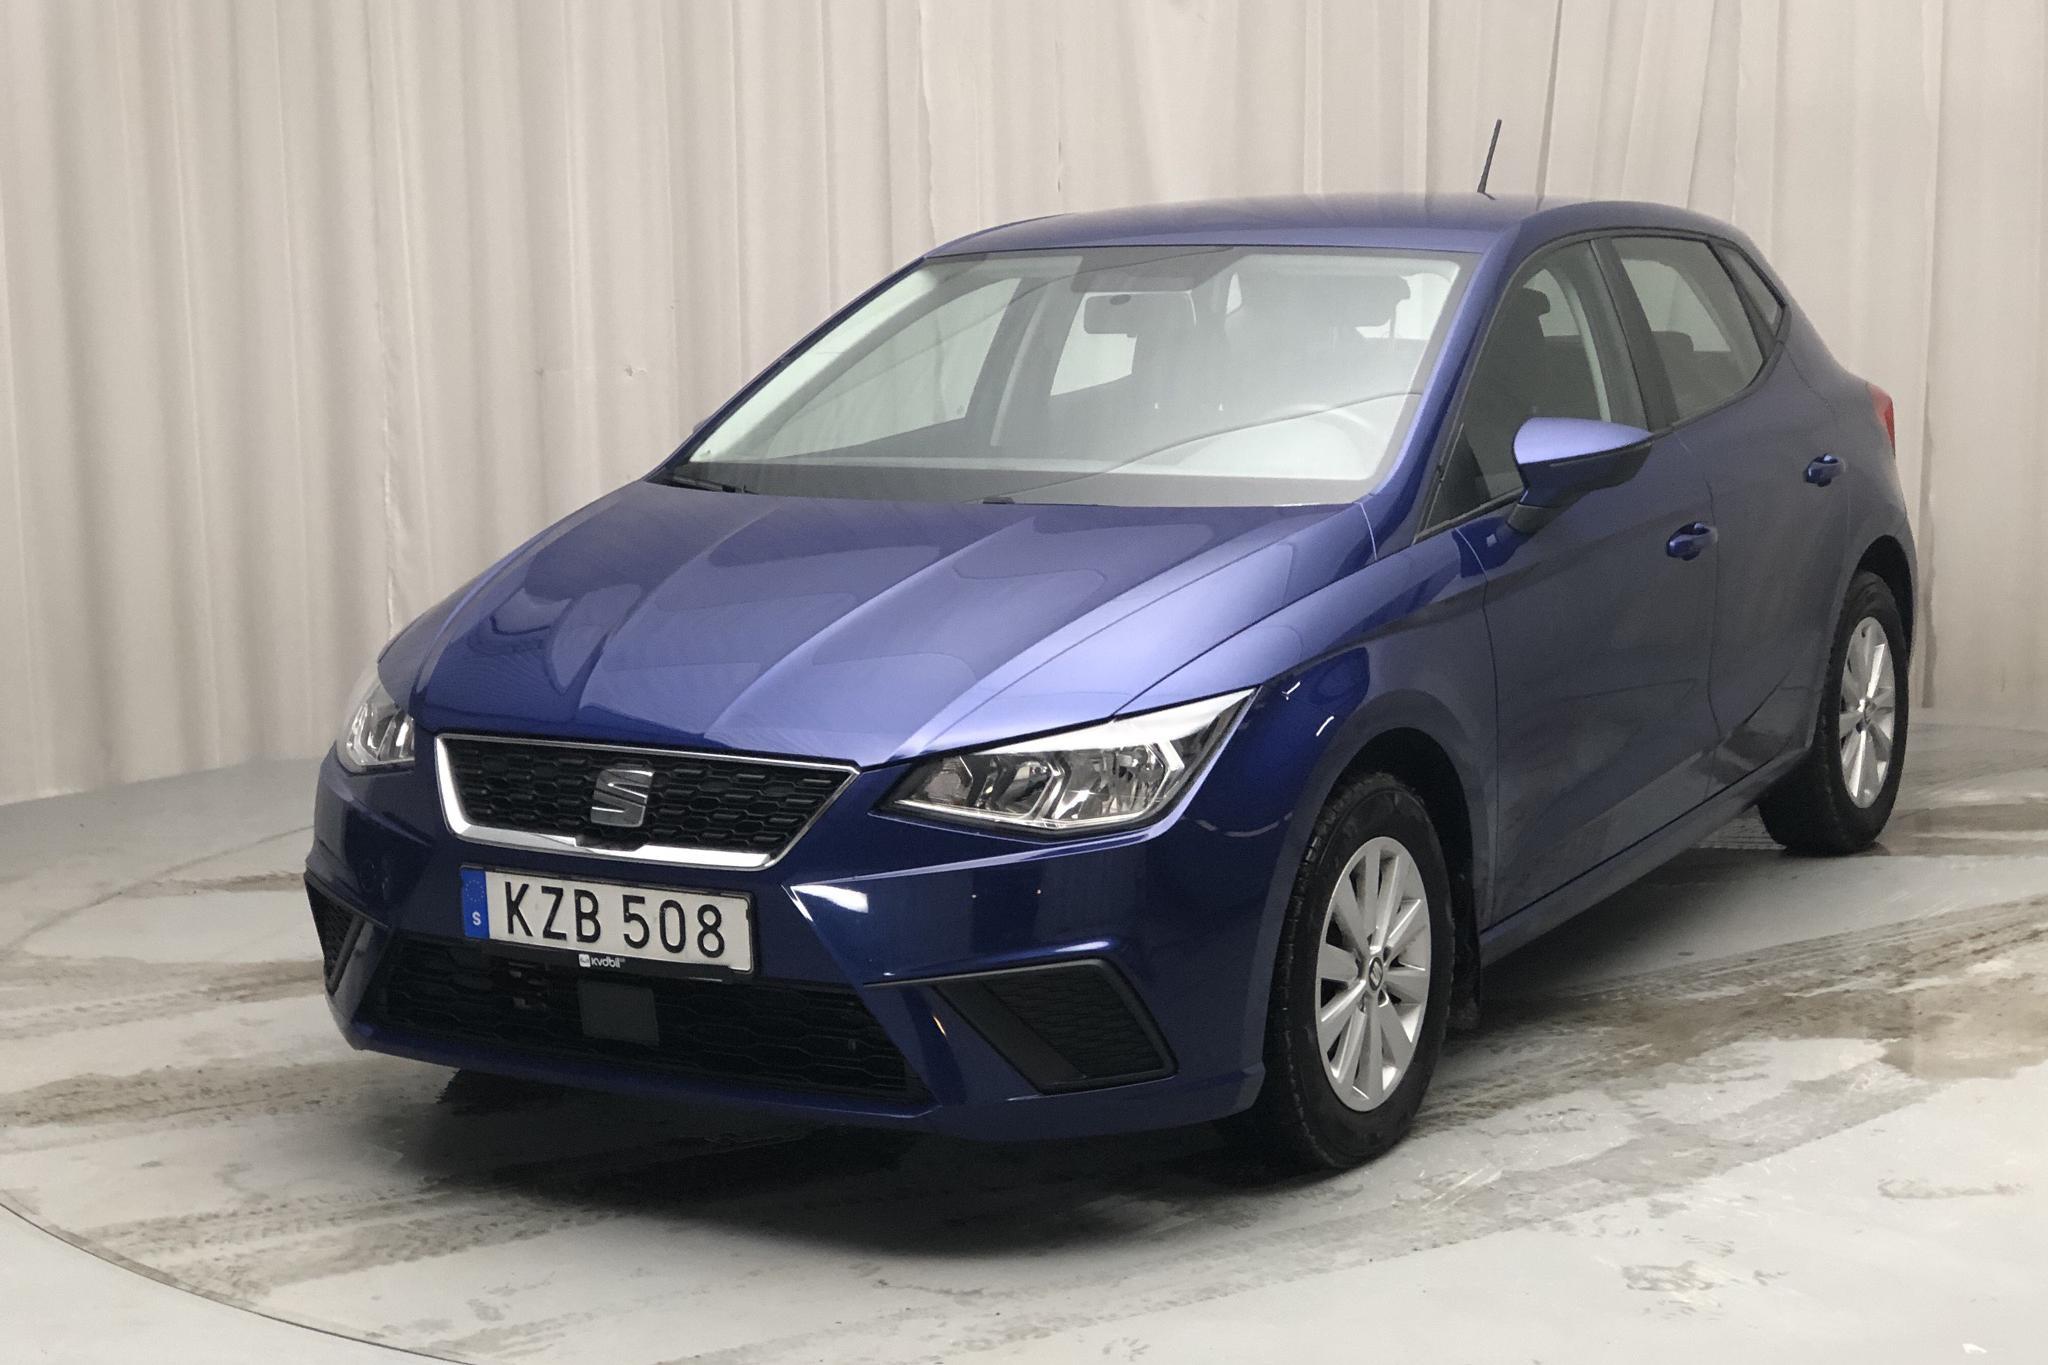 Seat Ibiza 1.0 TSI 5dr (95hk) - 3 219 mil - Manuell - blå - 2018